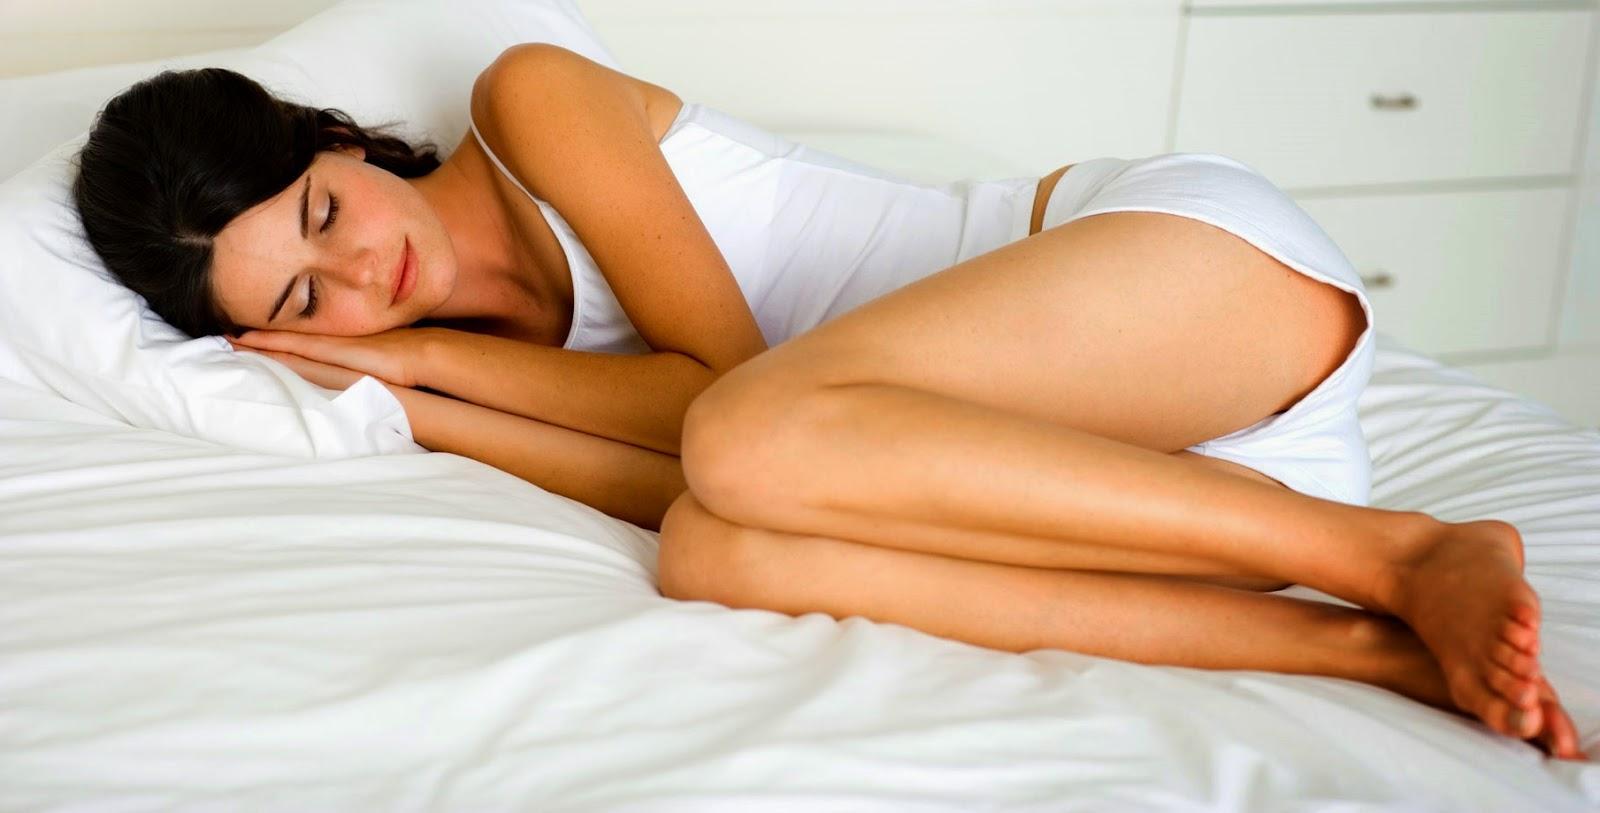 Dormir chica japonesa tira